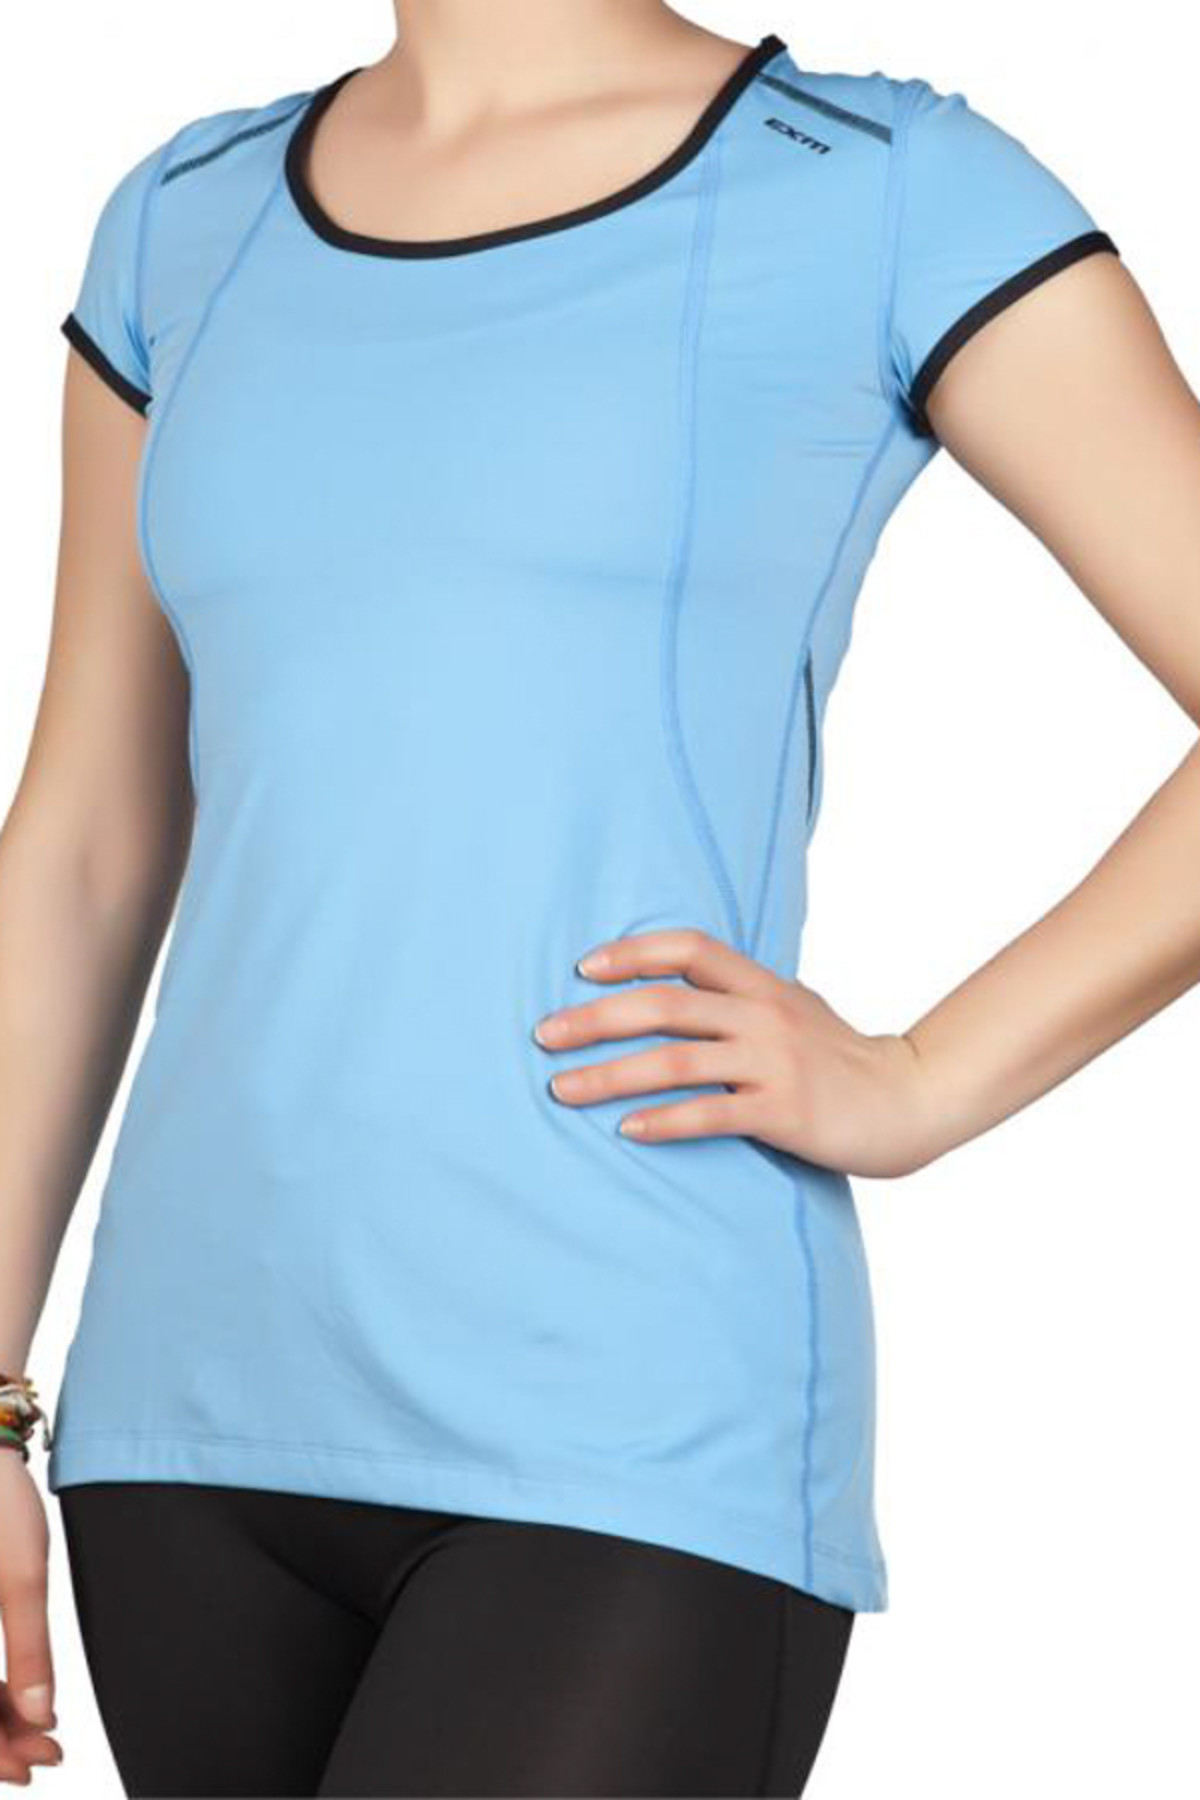 Exuma Kadın Mavi T-shirt - 142252 1